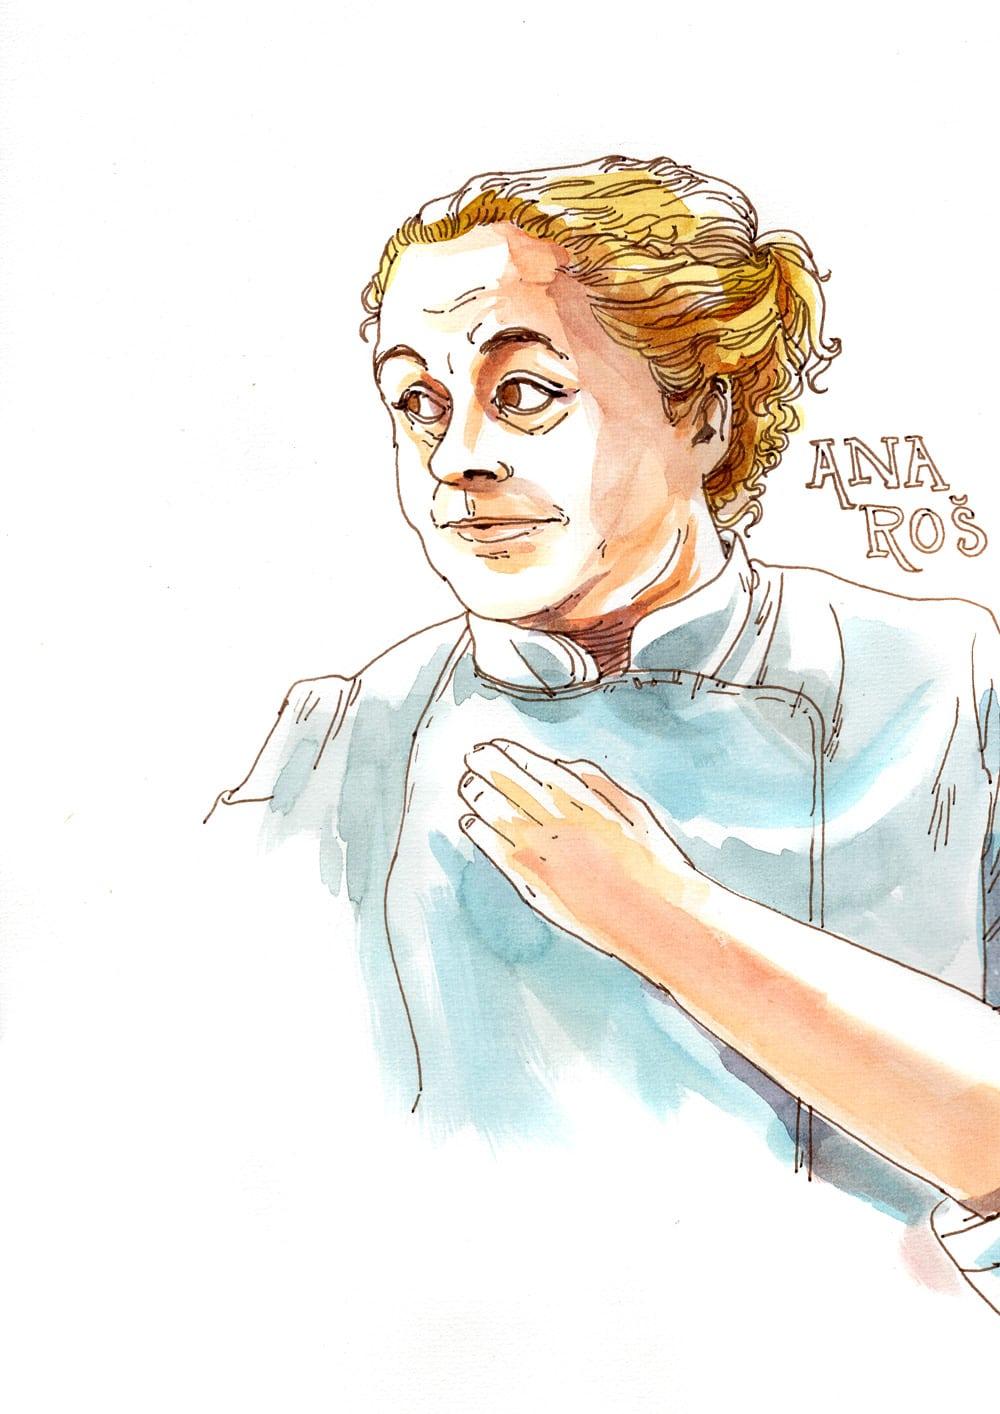 Illustration Chefs de cuisine Ana Ros